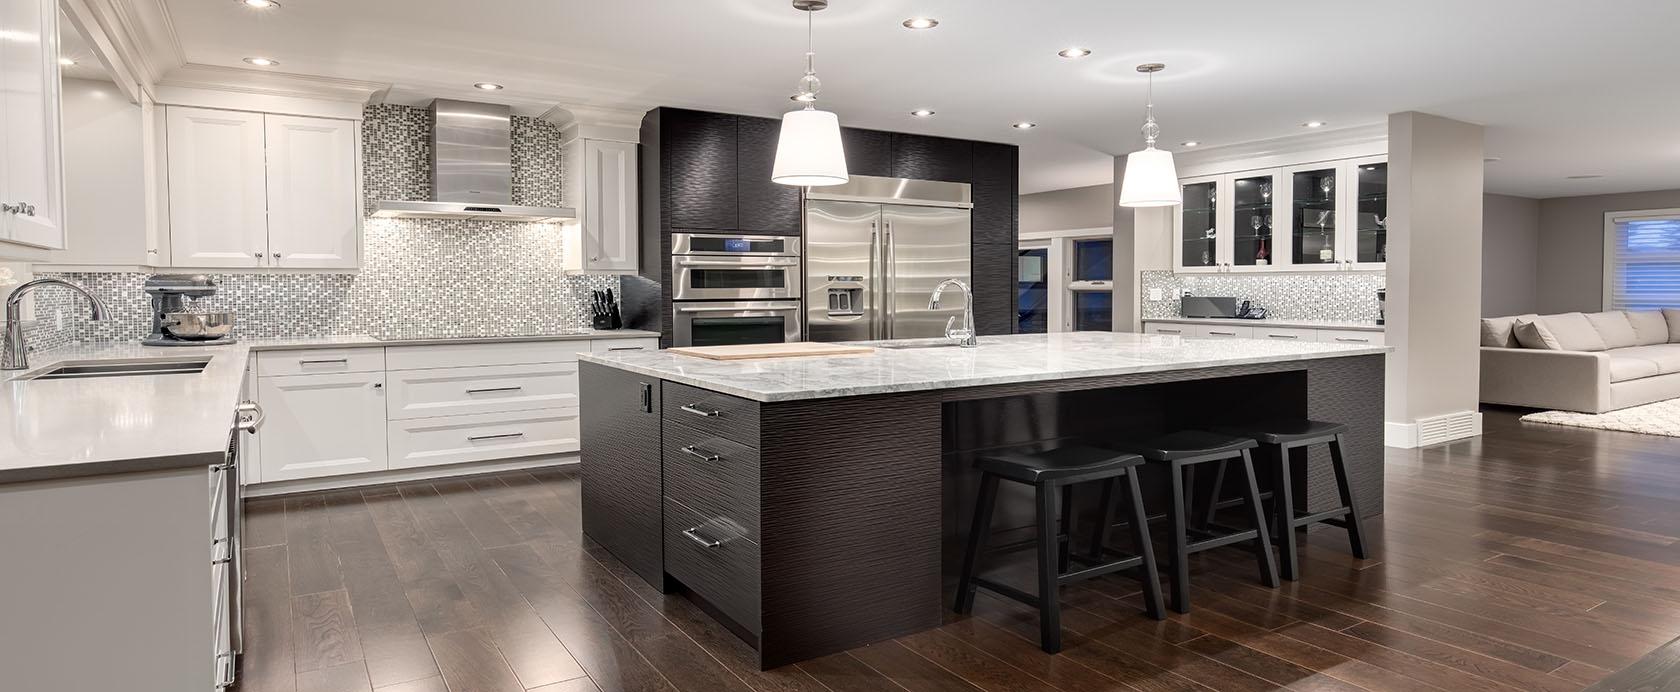 Premium Renovation Ltd.   Custom Homes & Renovations in Calgary